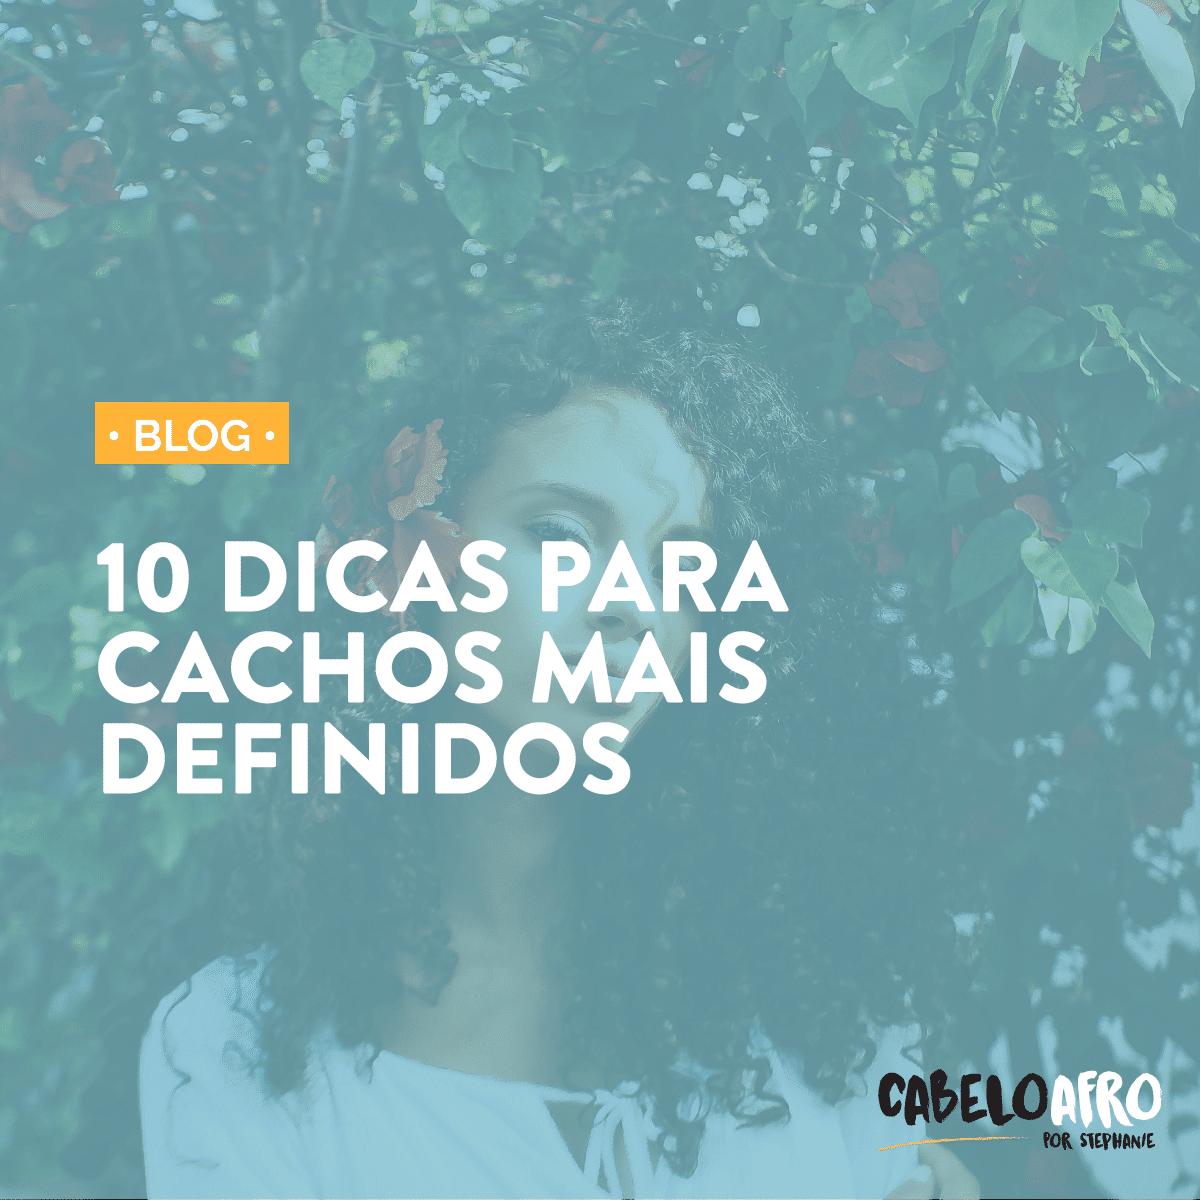 DICAS PARA CACHOS DEFINIDOS 3185190 9306899